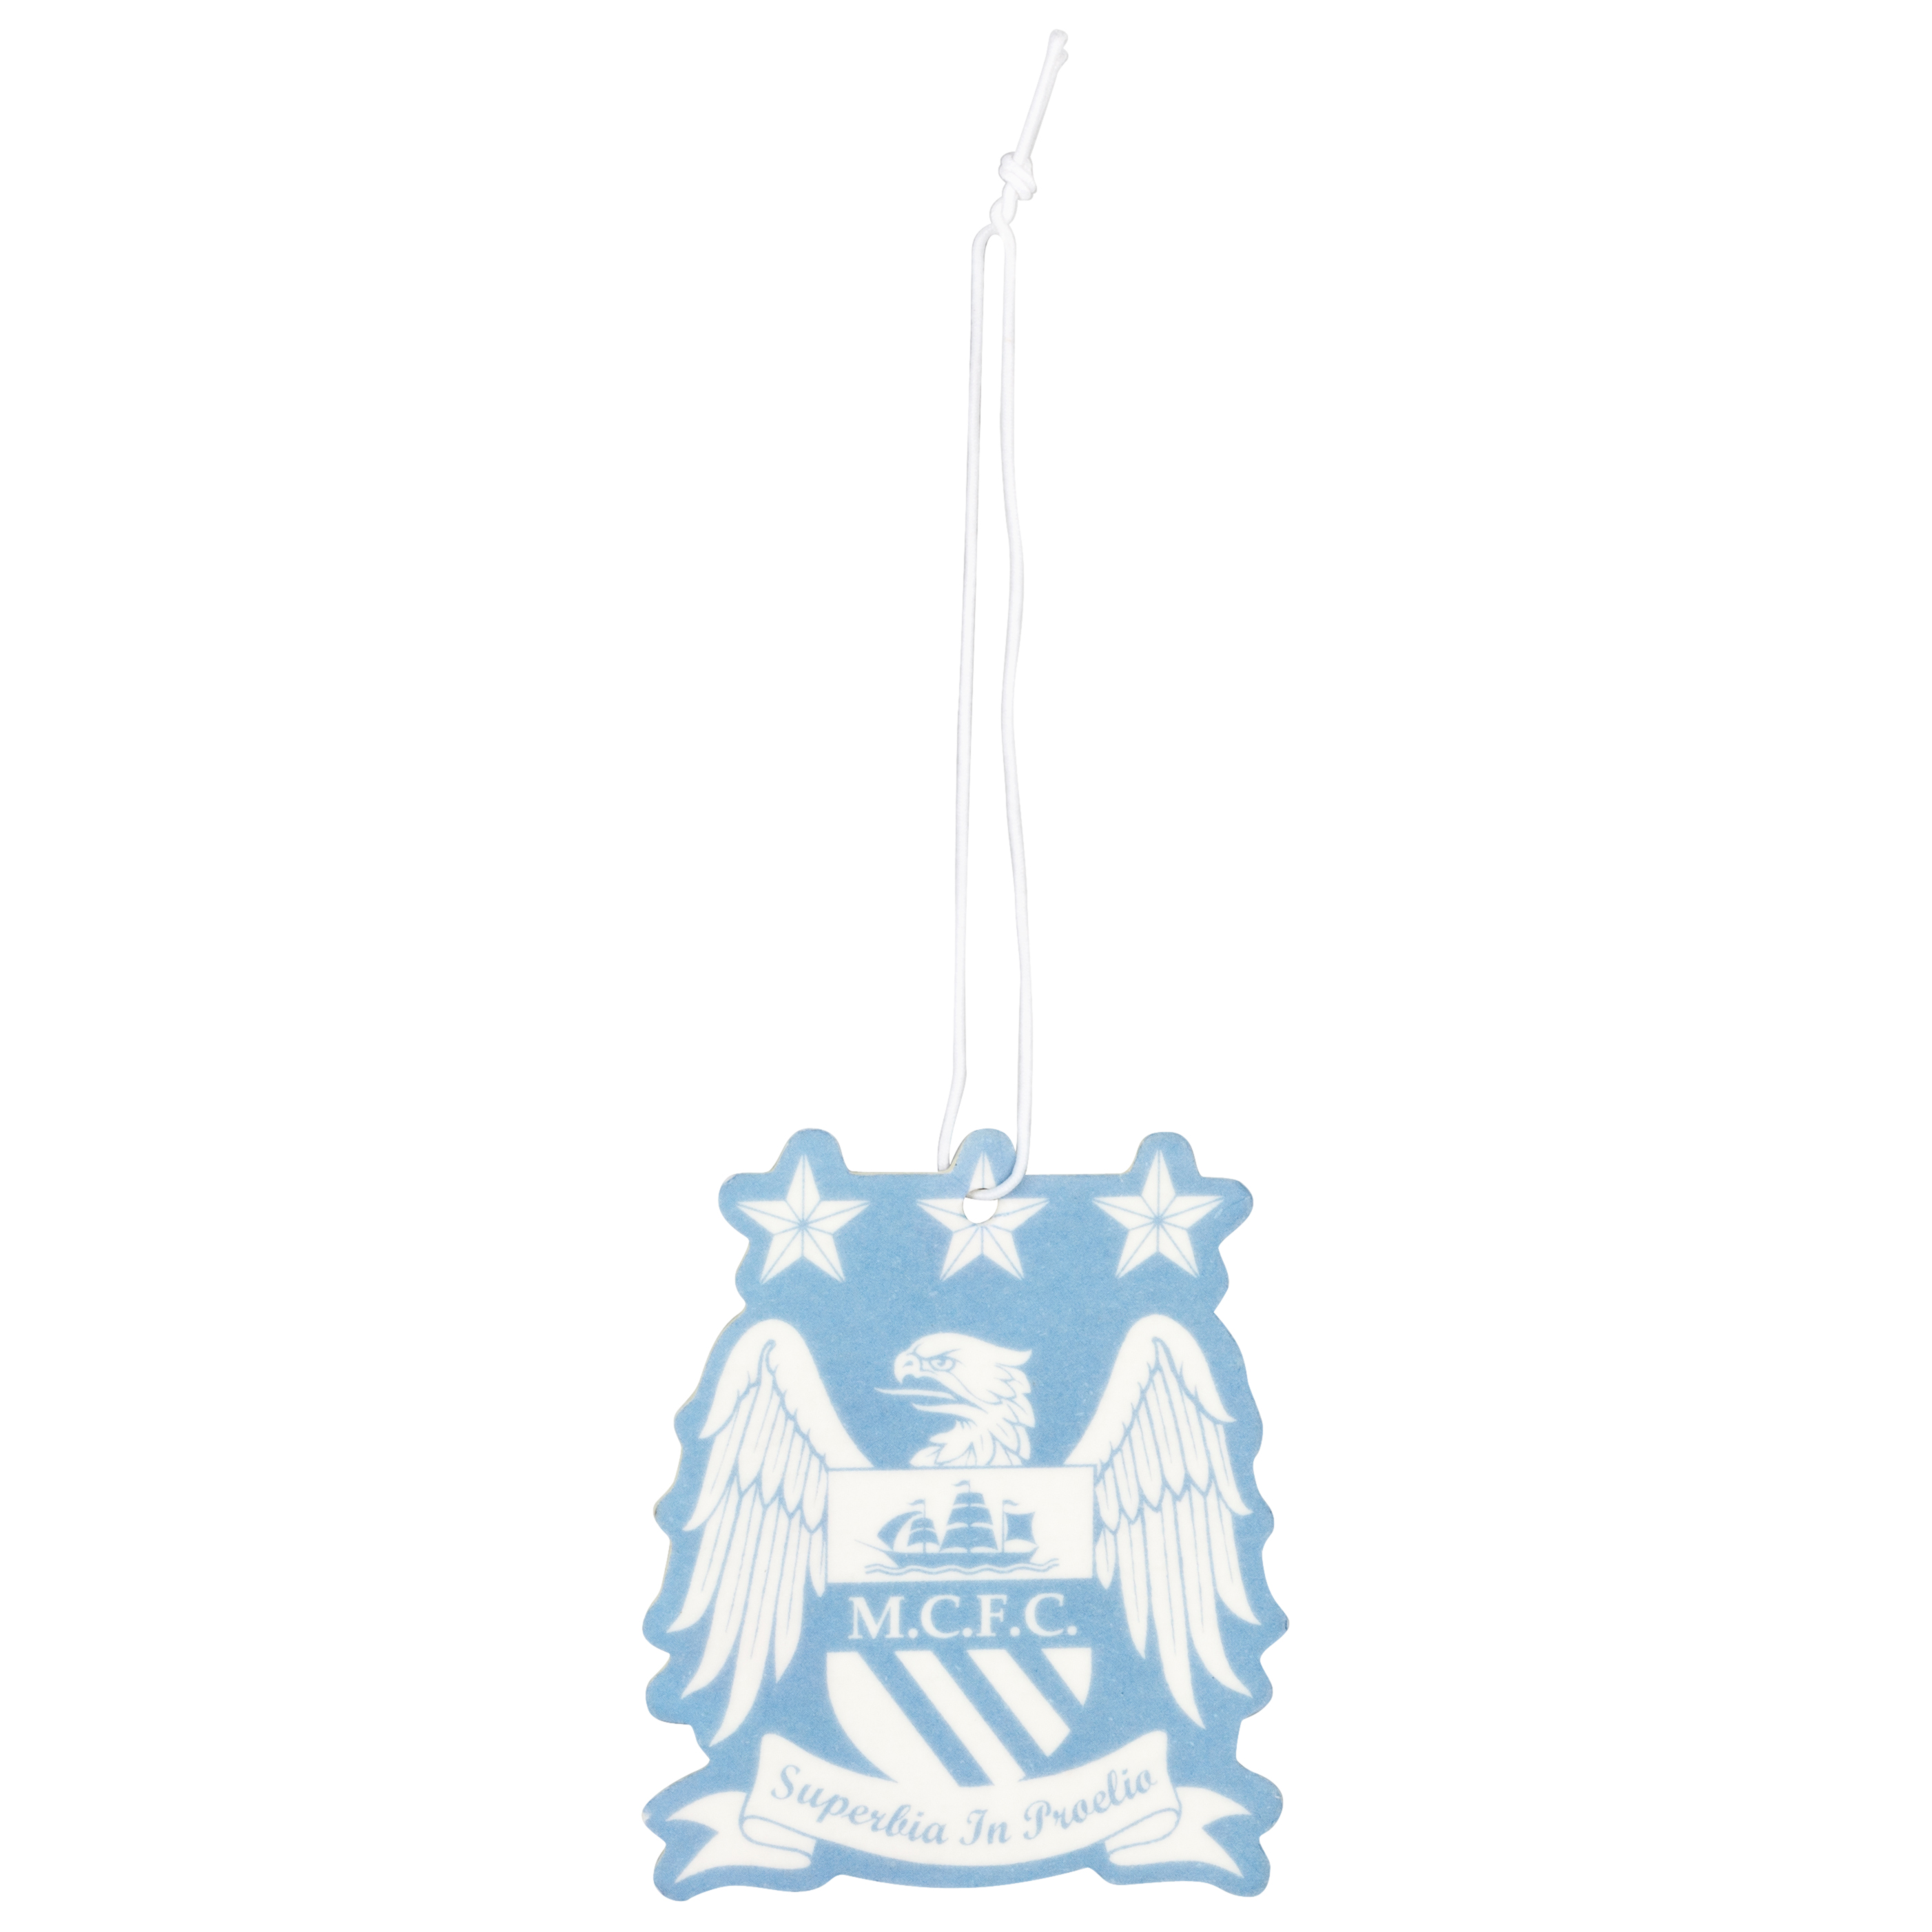 Manchester City Tonal Crest Air Freshener